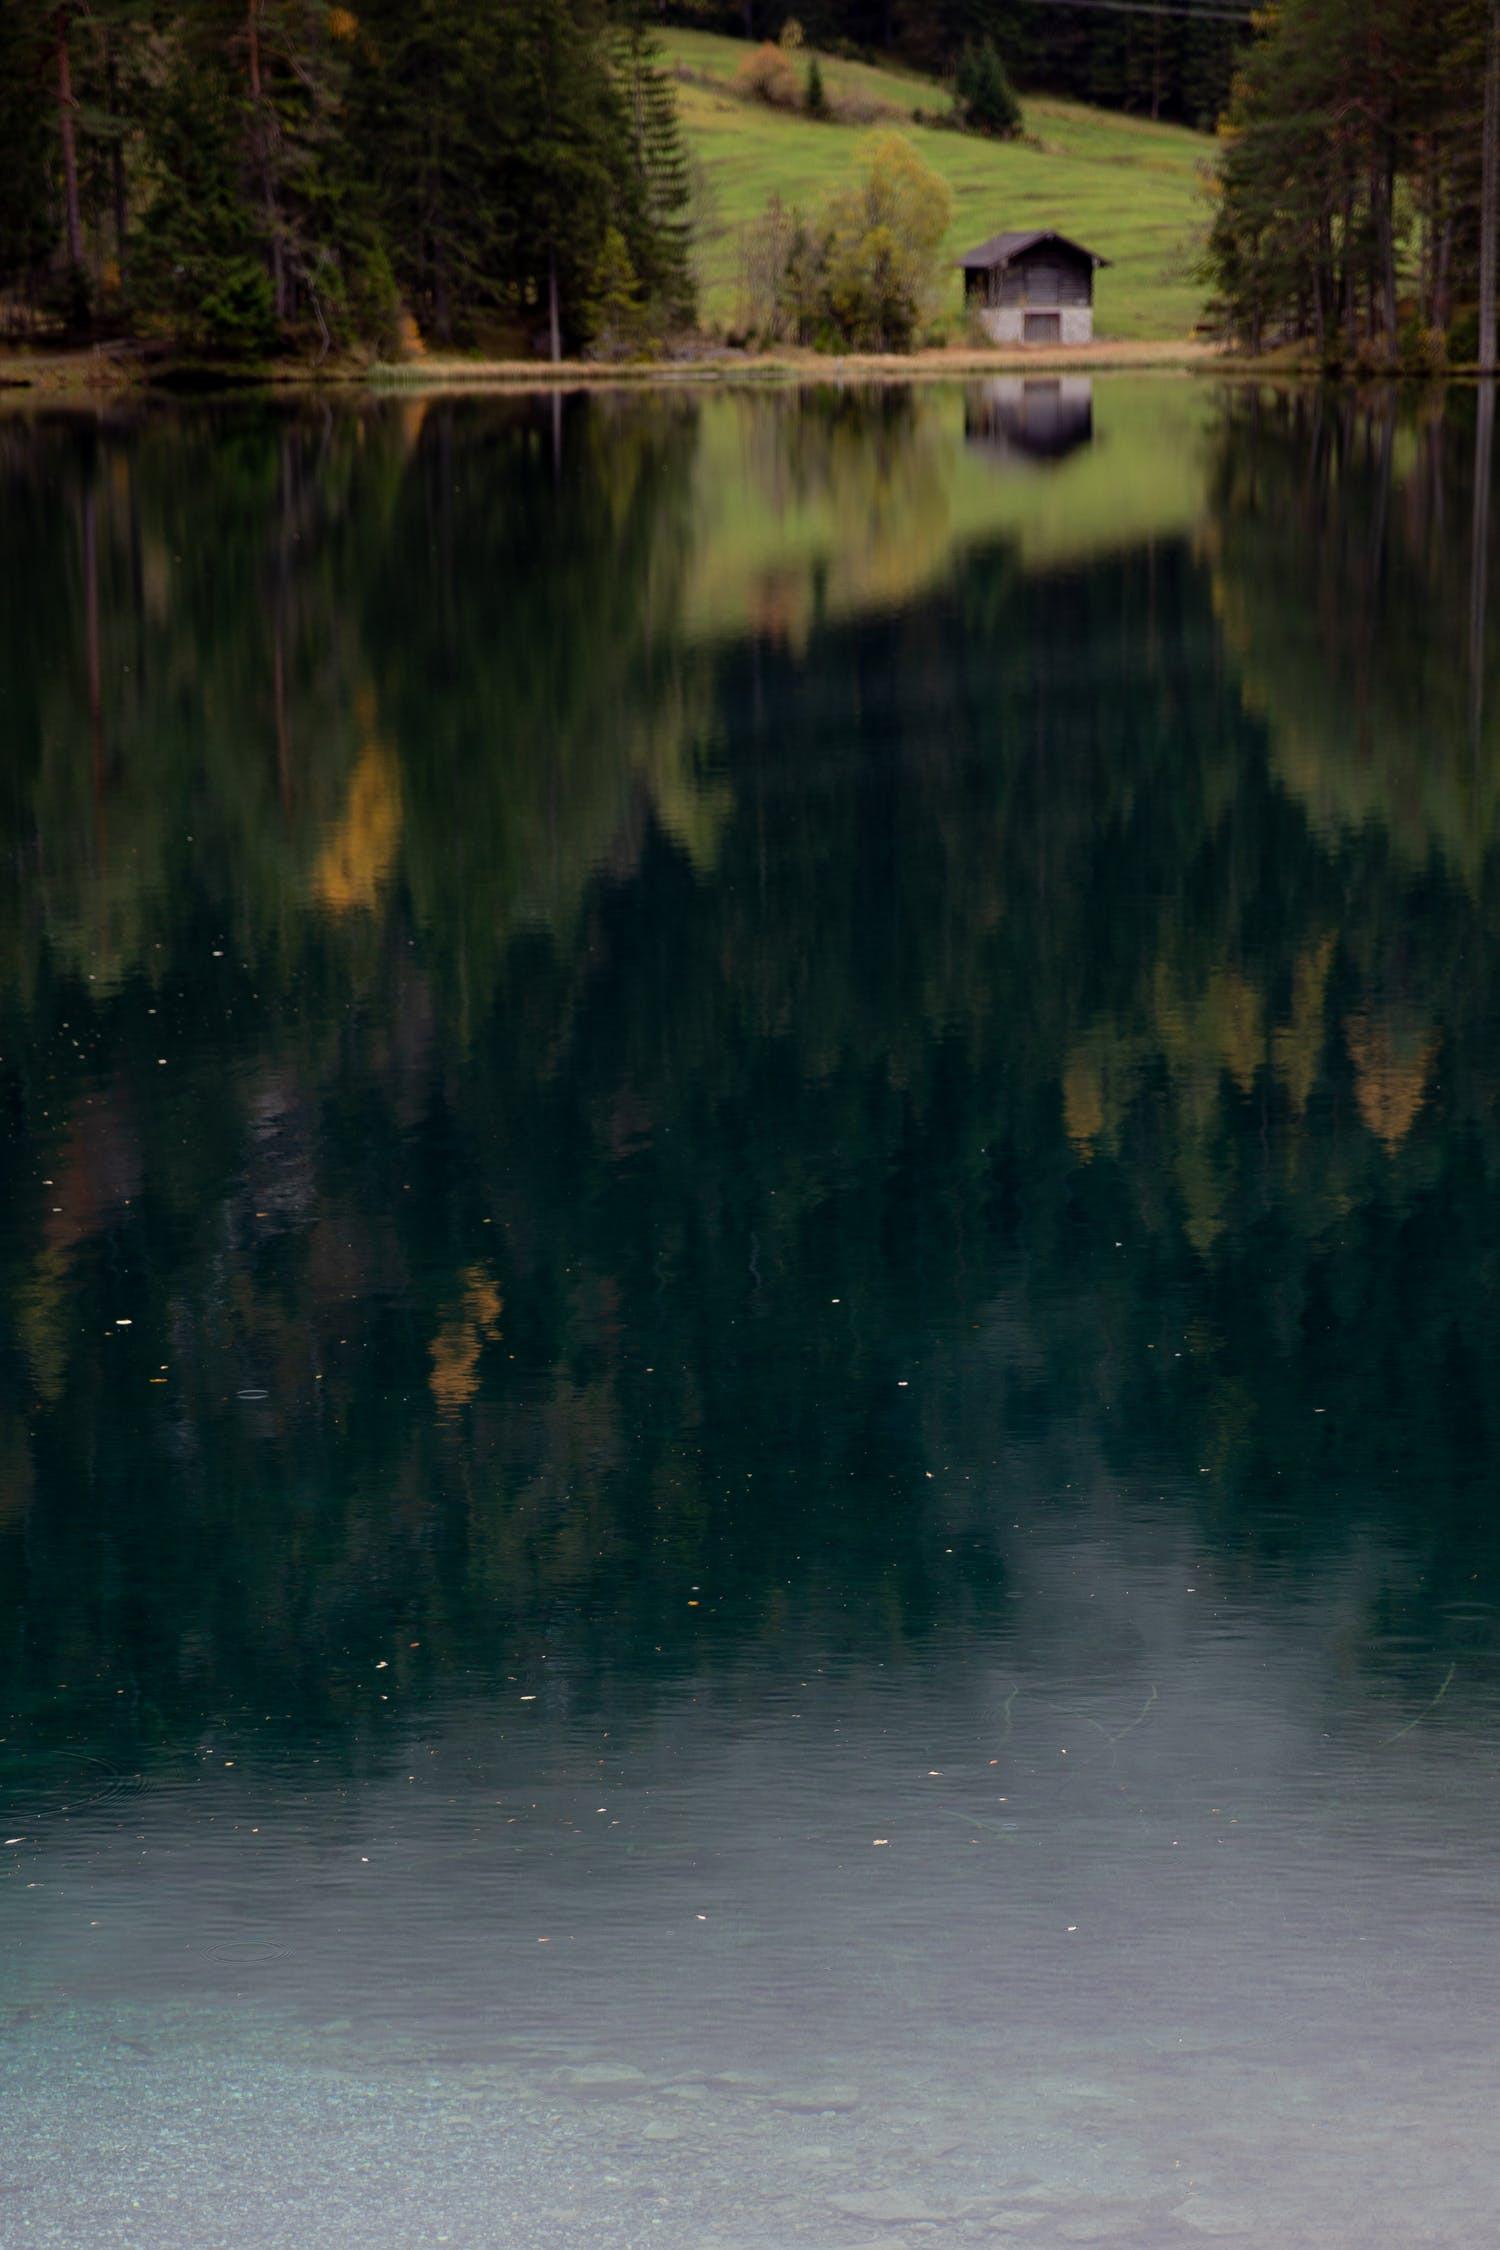 pexels-photo-3934054.jpeg